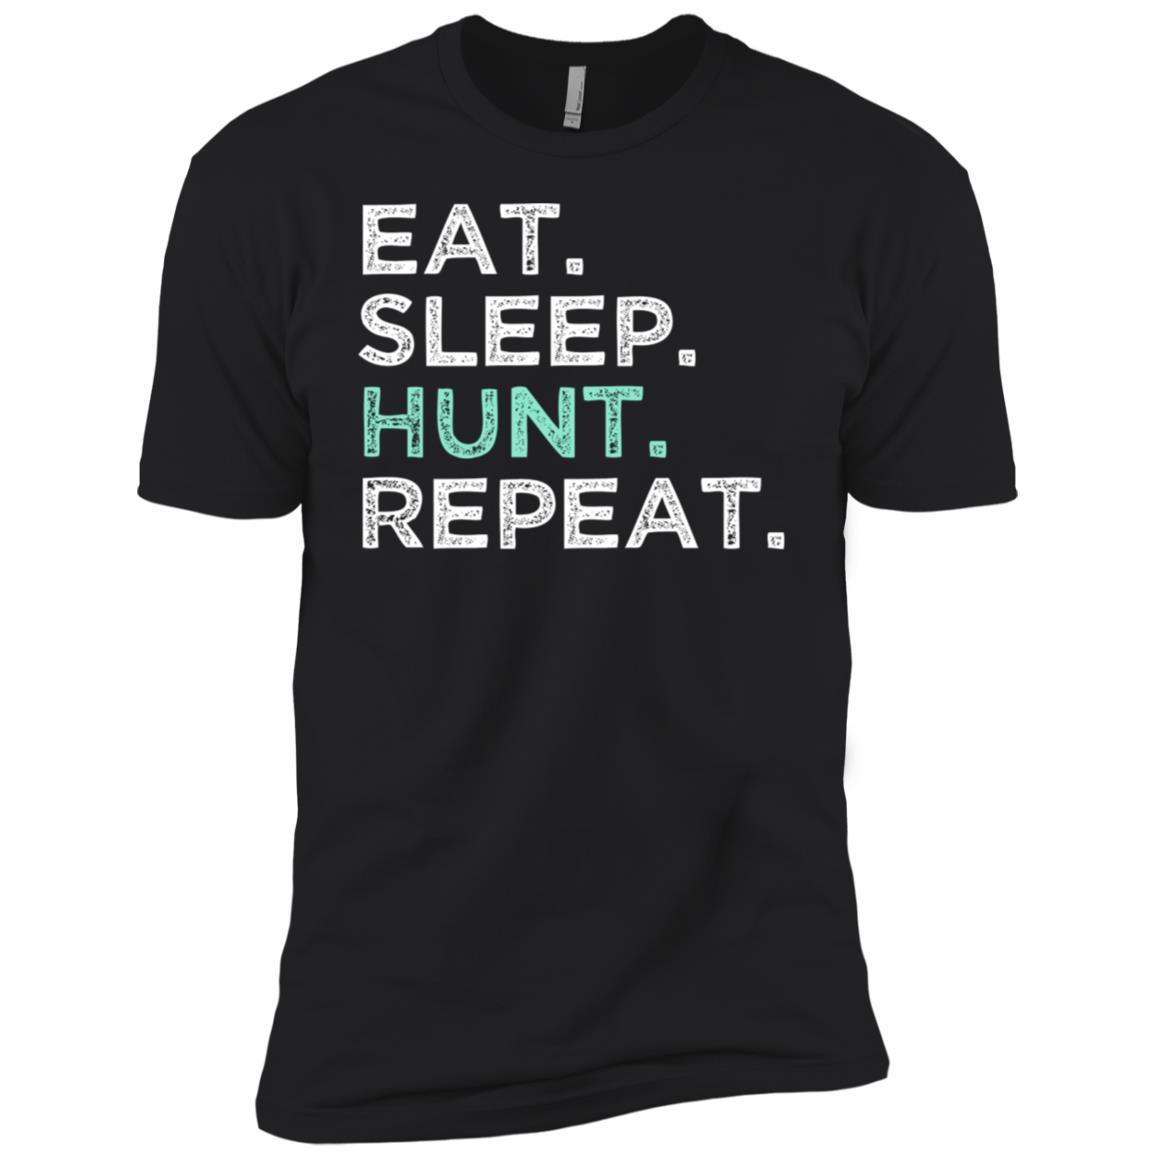 Eat Sleep Hunt Repeat. Funny Hunting Men Short Sleeve T-Shirt